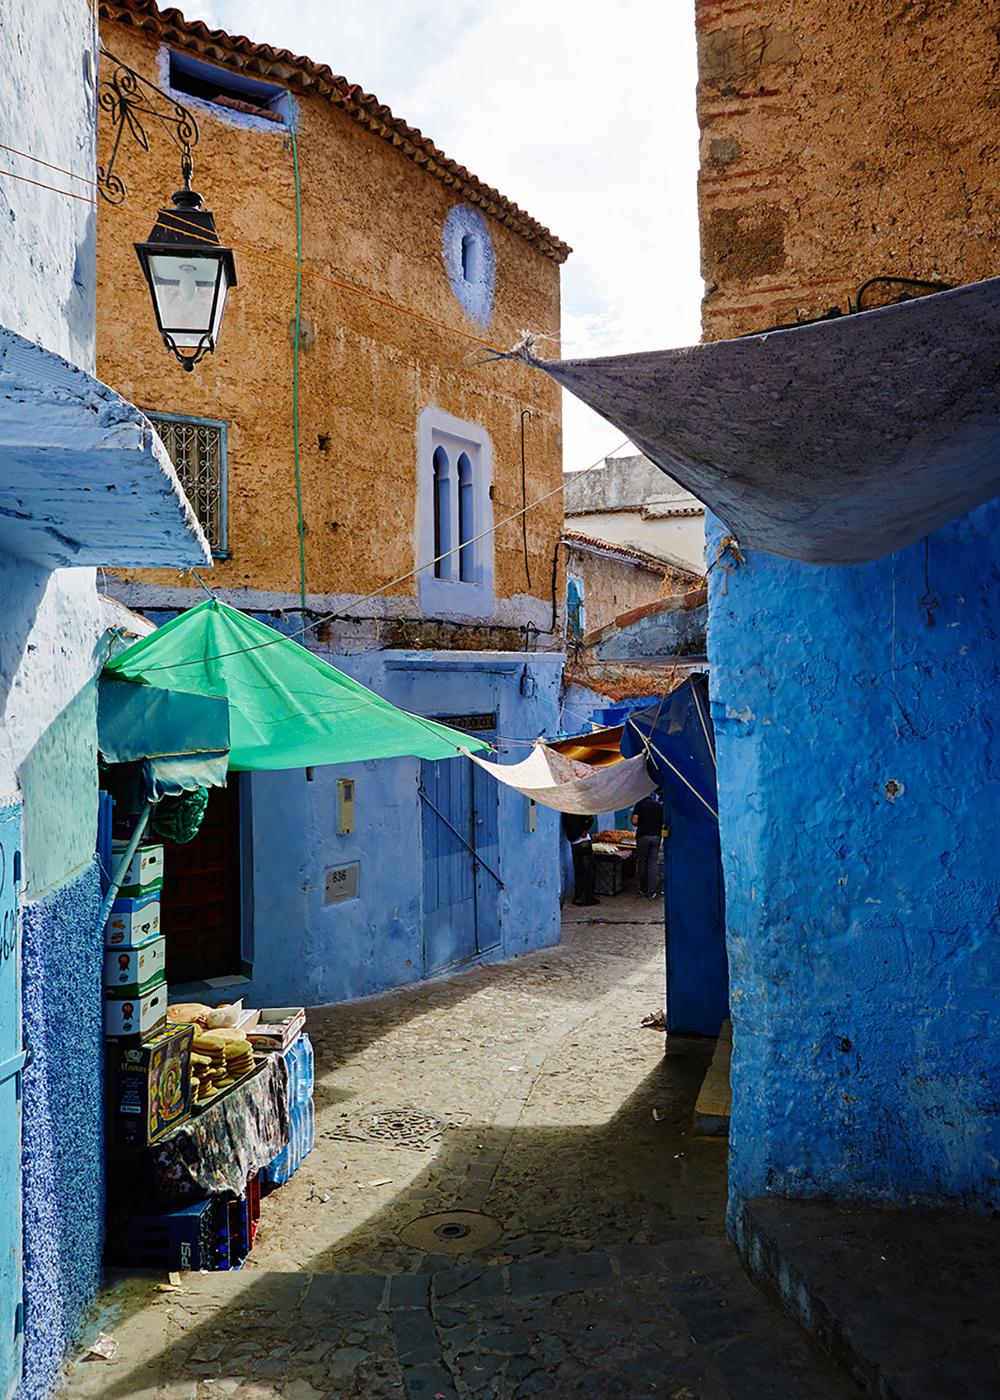 Anna_McKerrow_Morocco_06.jpg